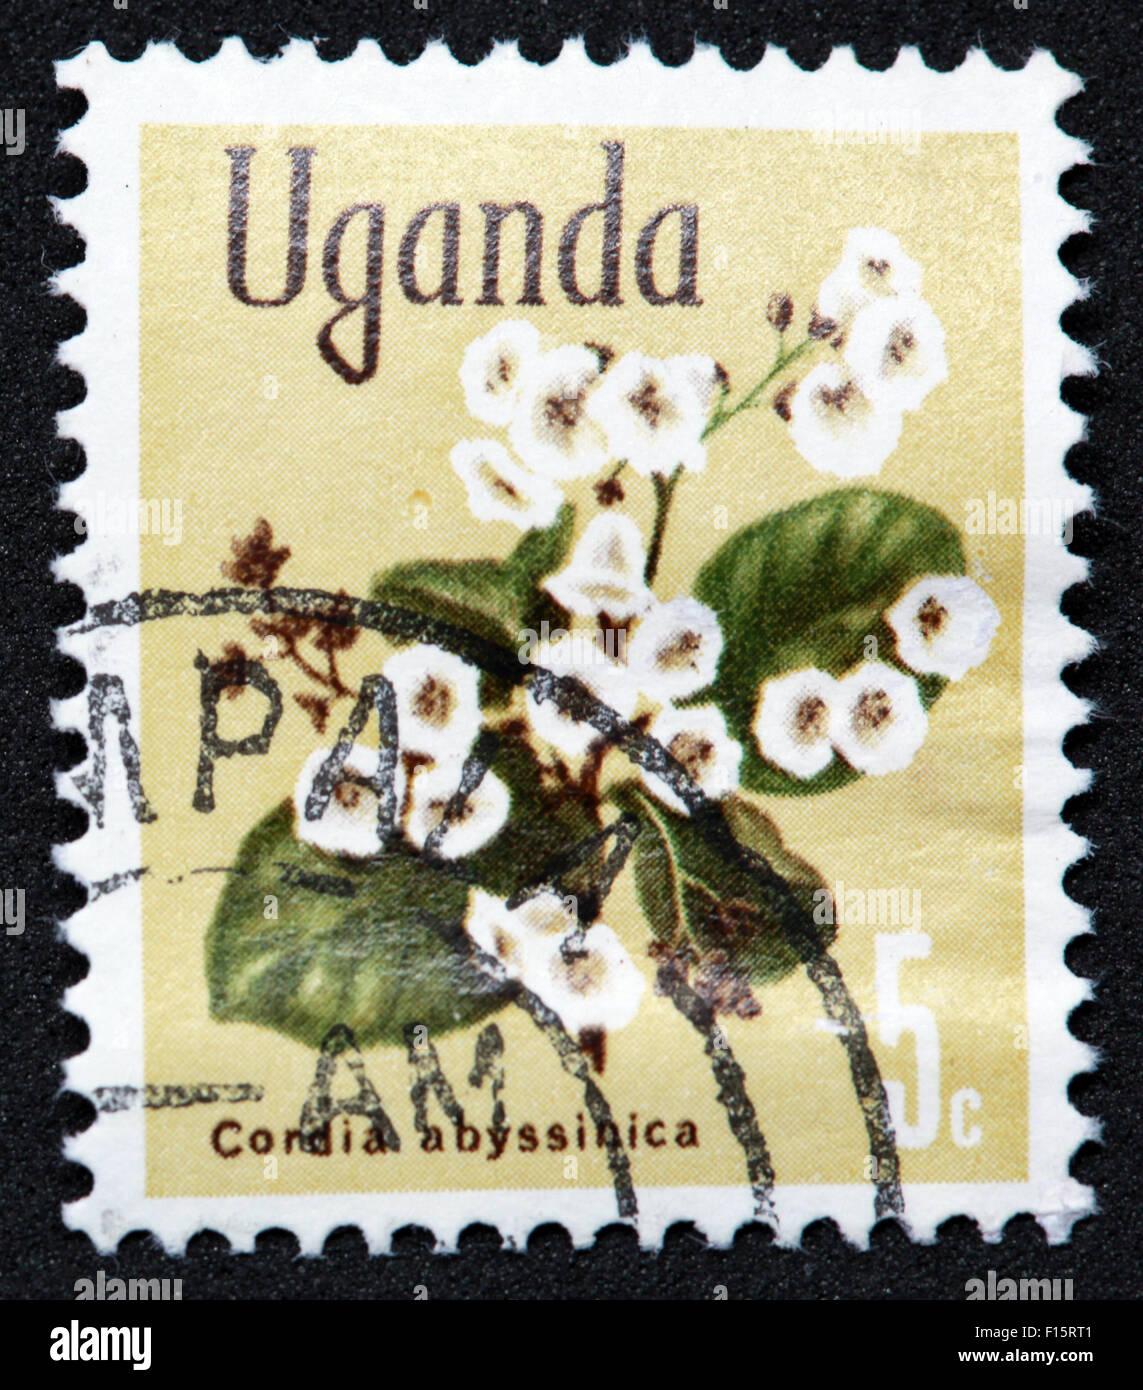 Uganda 5c plant flower Condia abyssinica Stamp - Stock Image